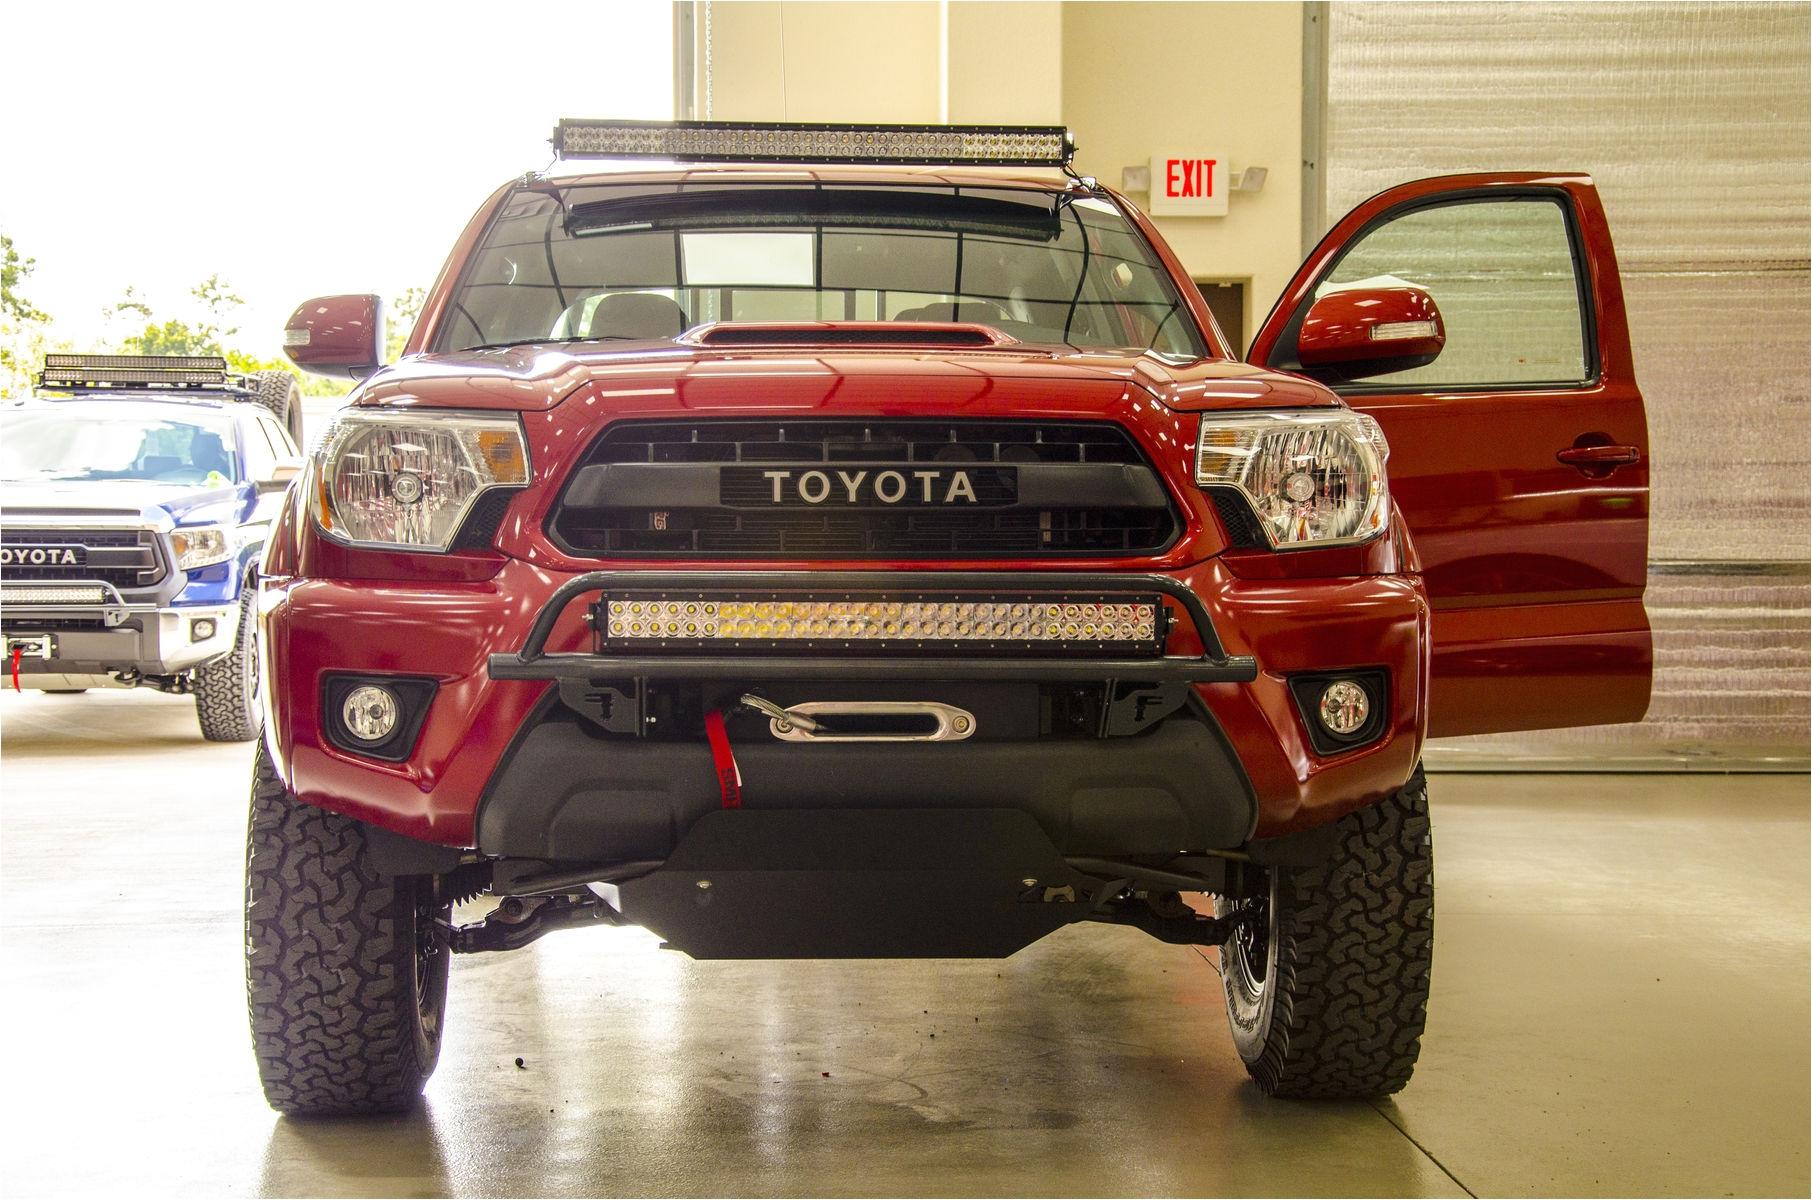 2014 toyota tacoma n fab trd pro build toyota tacoma front leds shot